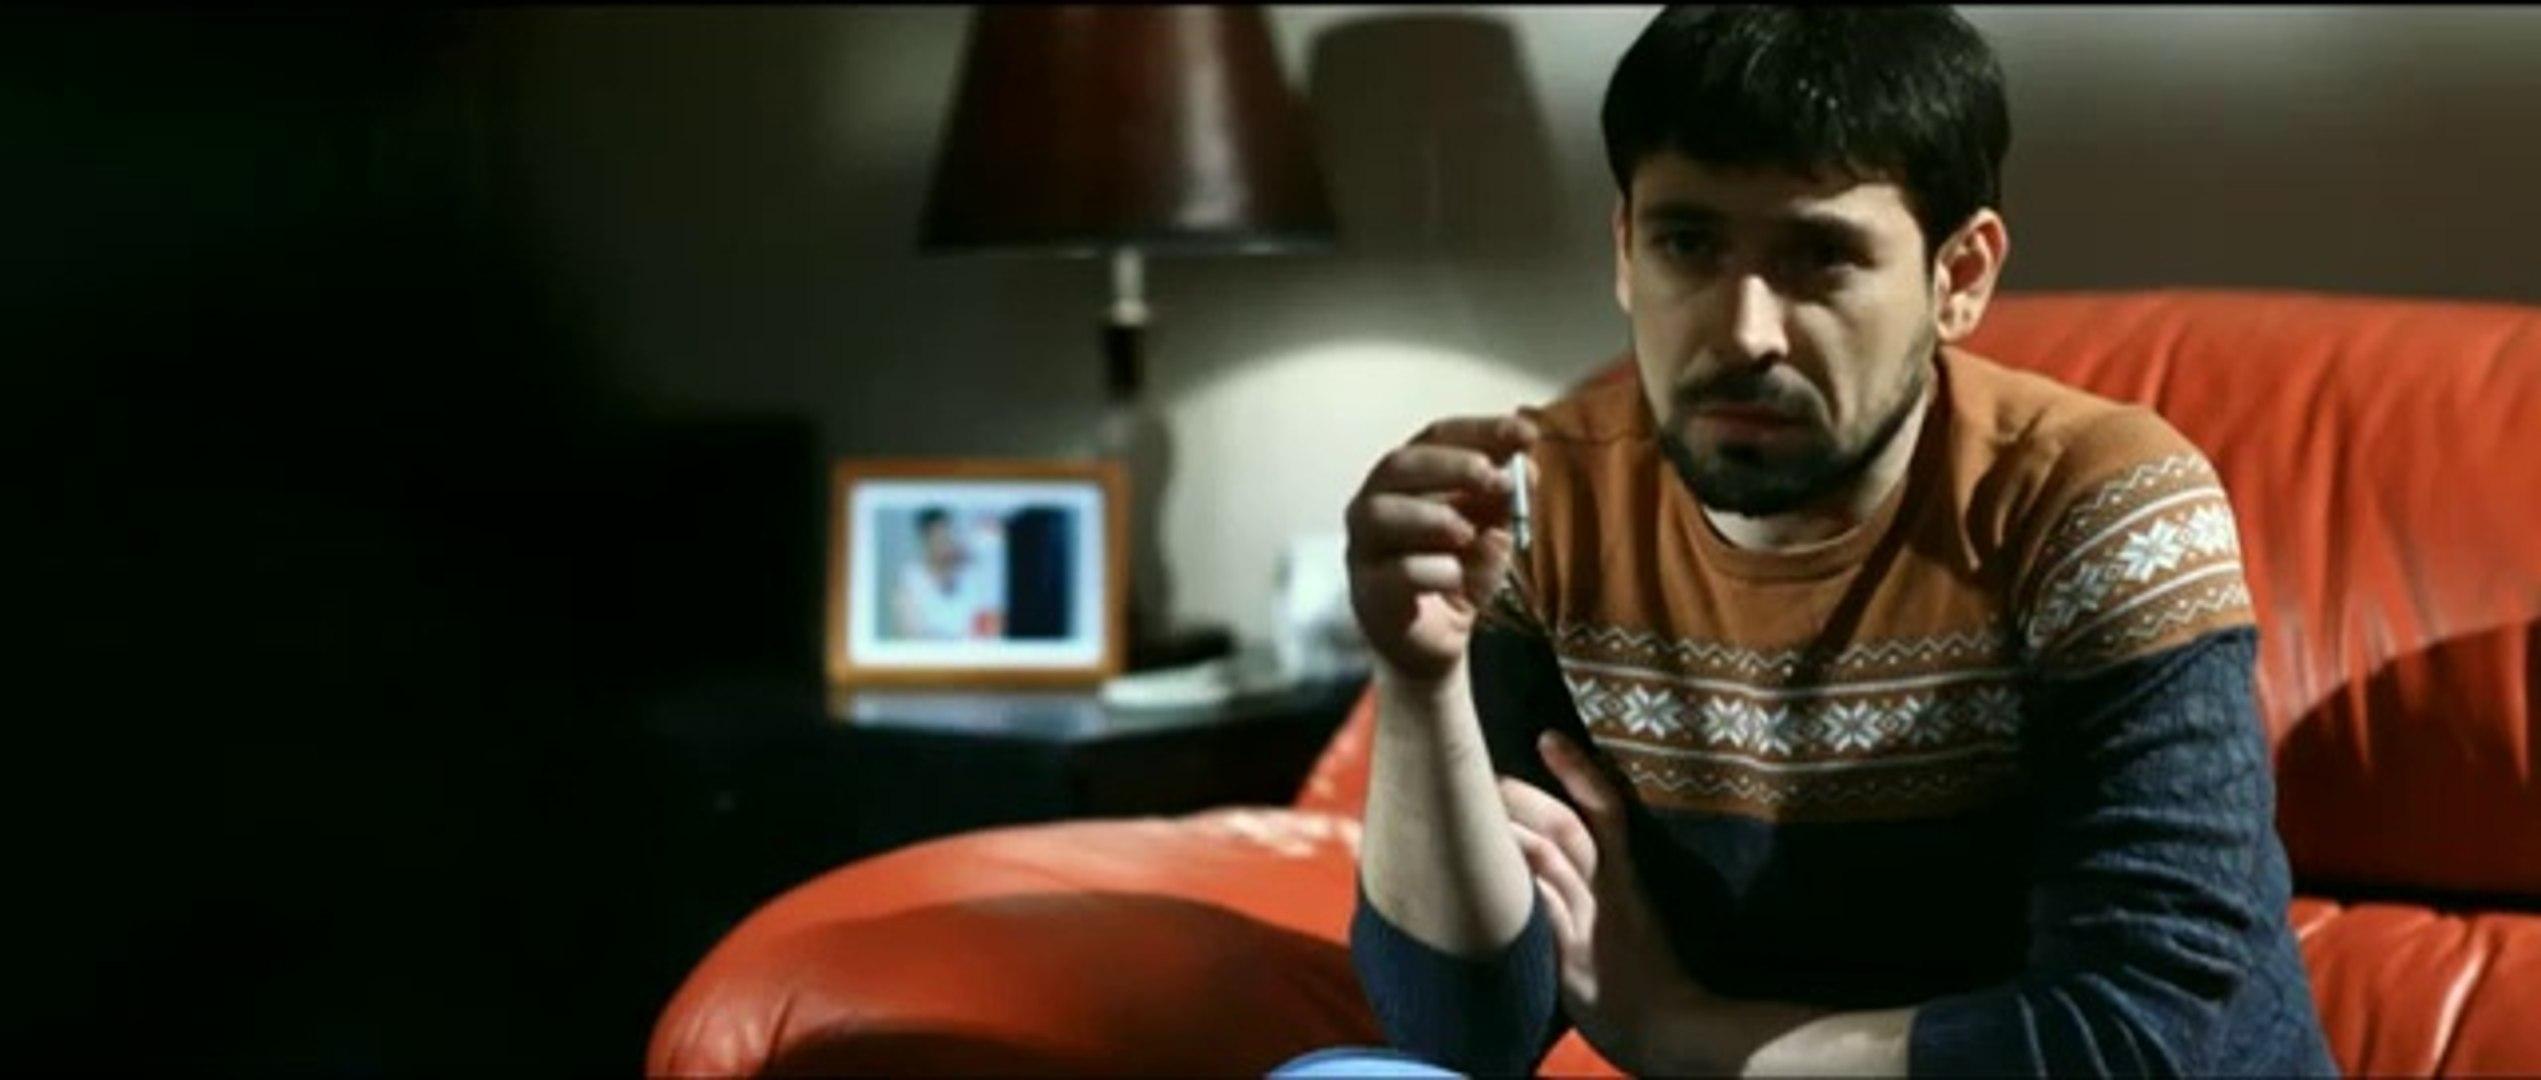 Смотреть онлайн армянский сериал Xaghic durs_13